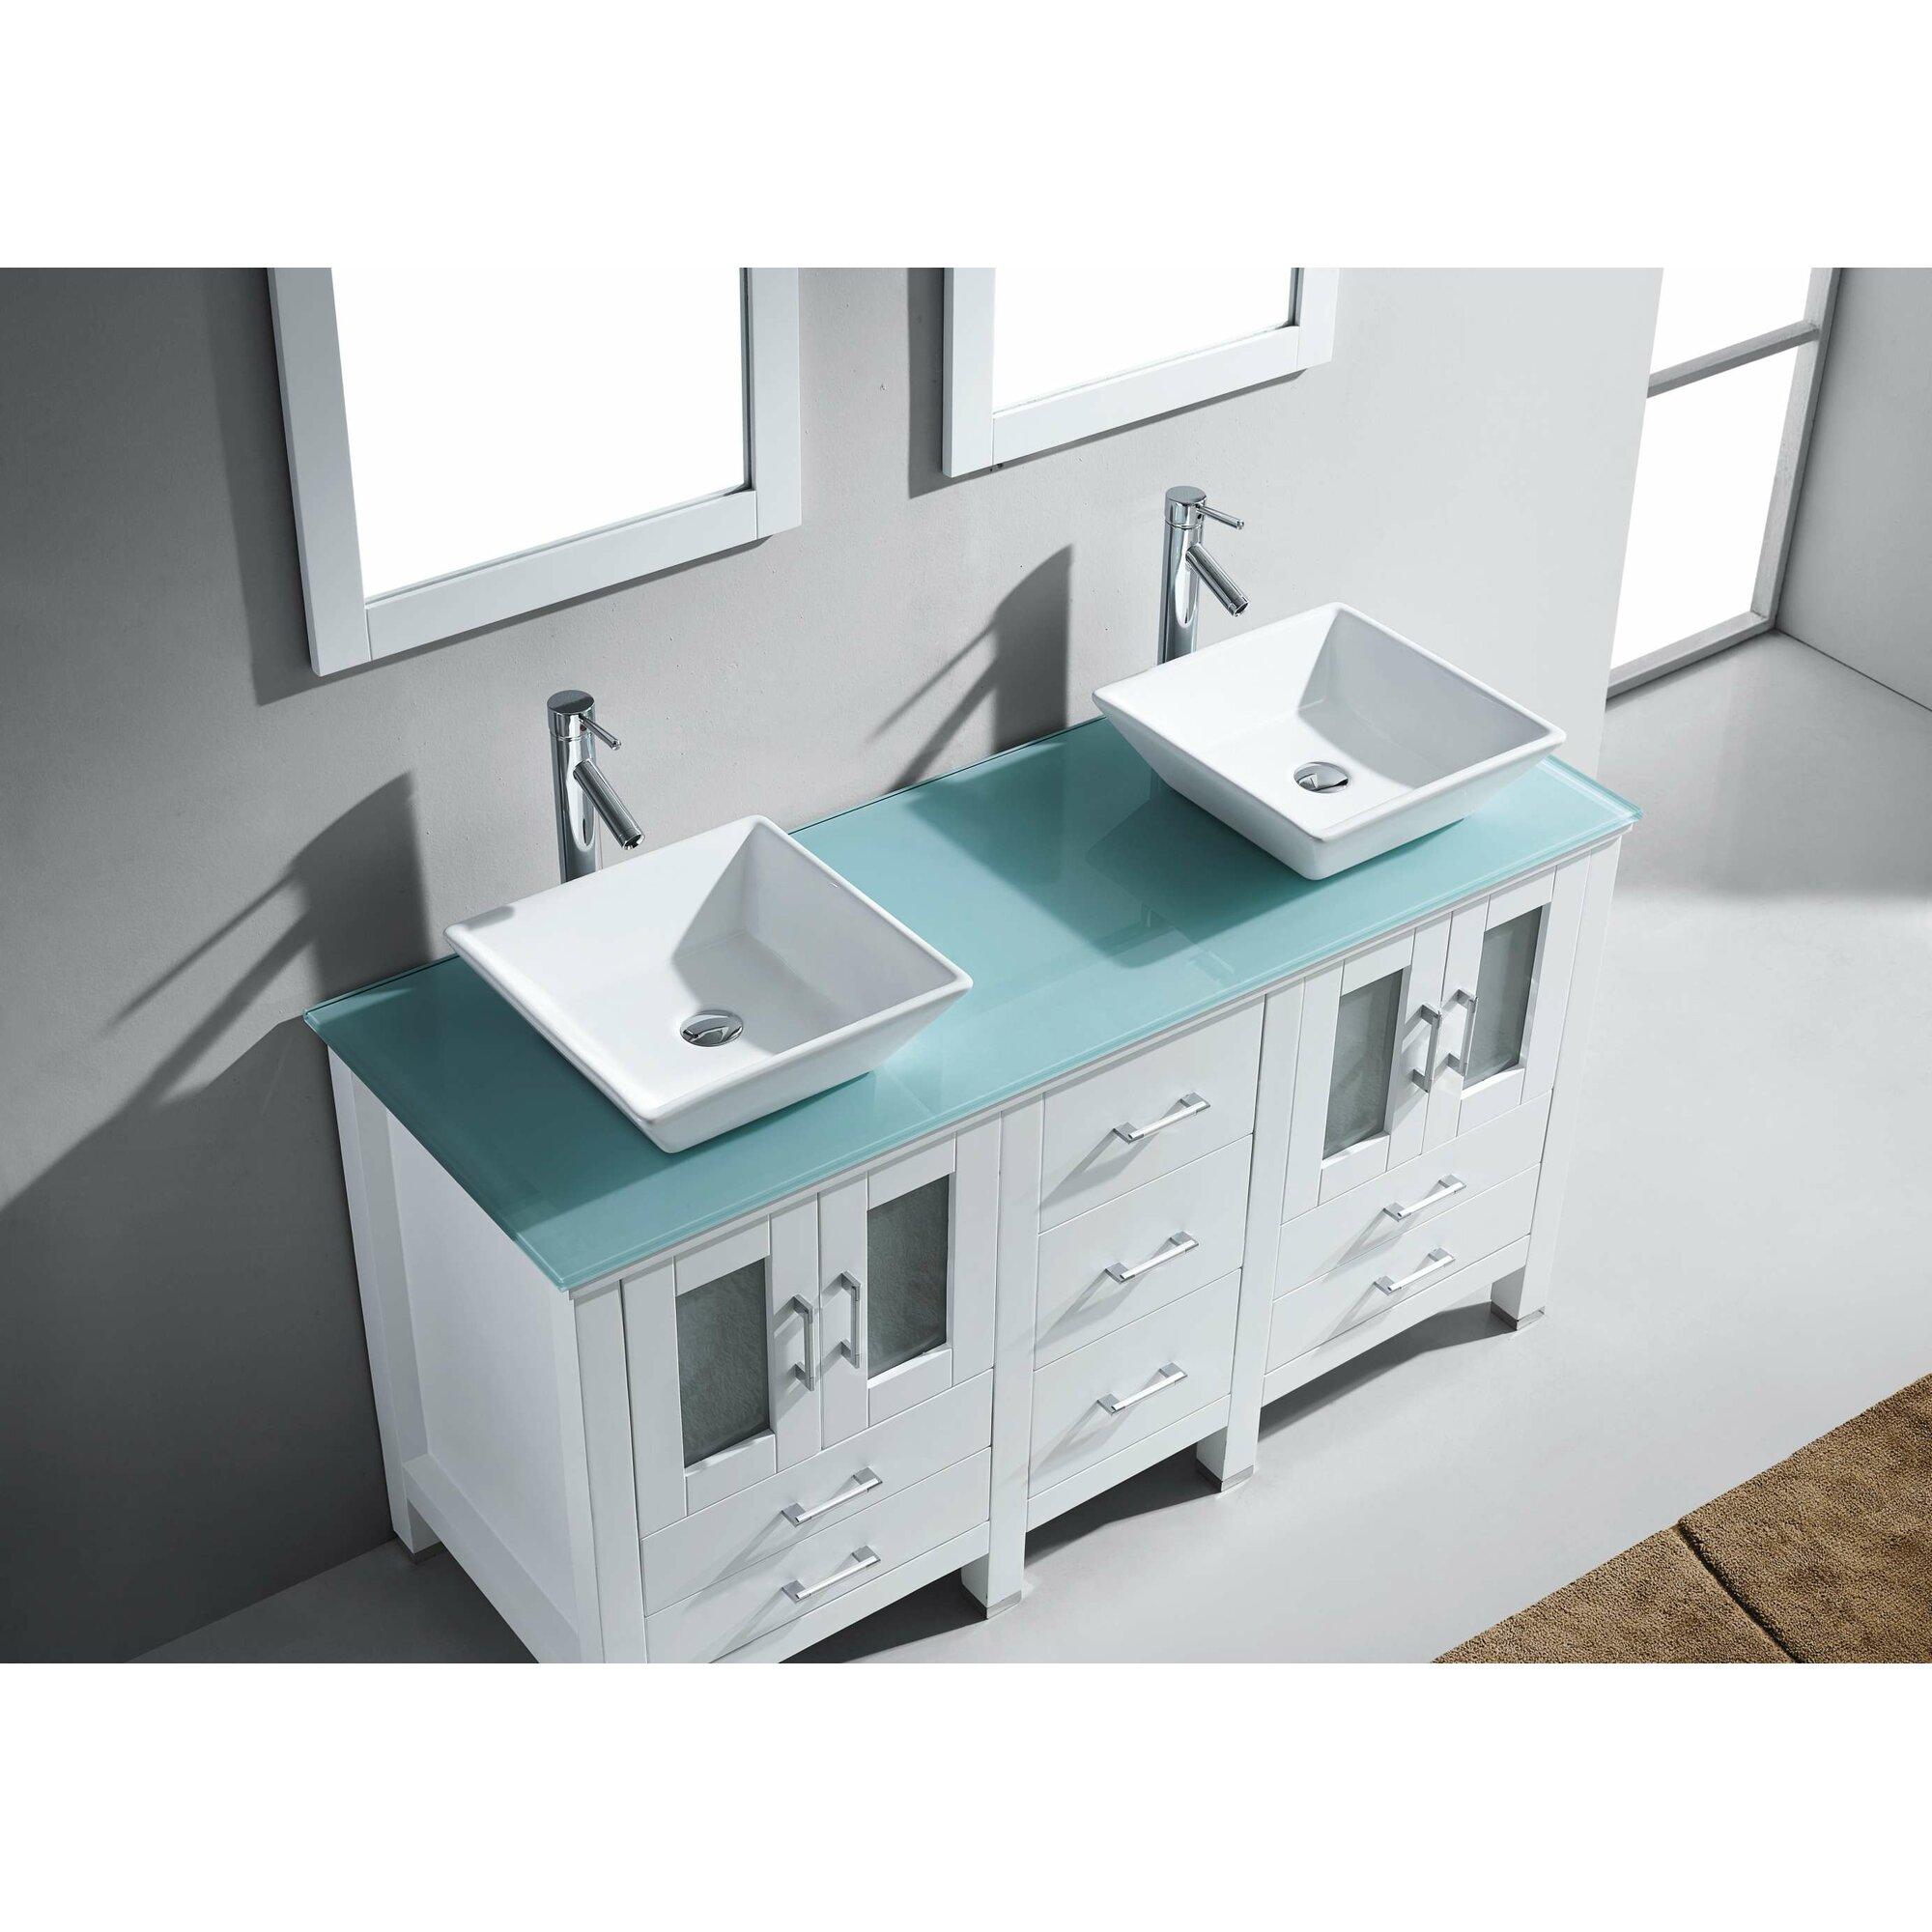 Bathroom Vanity Rochester Ny bathroom vanities rochester ny ~ instavanity